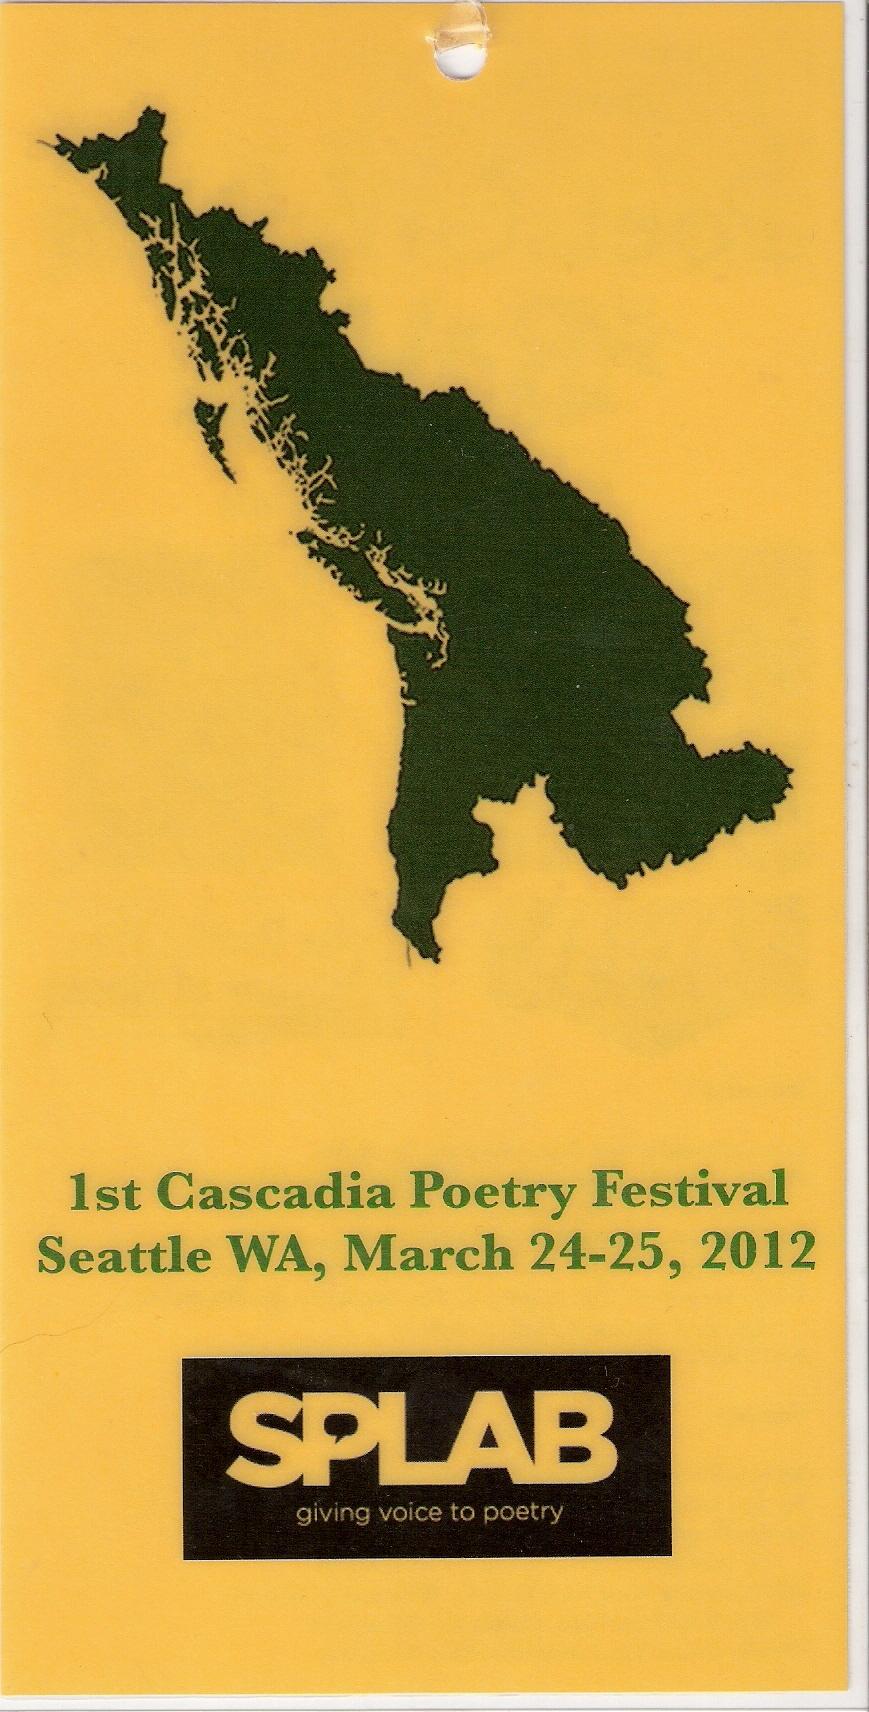 Cascadia Gold Passes